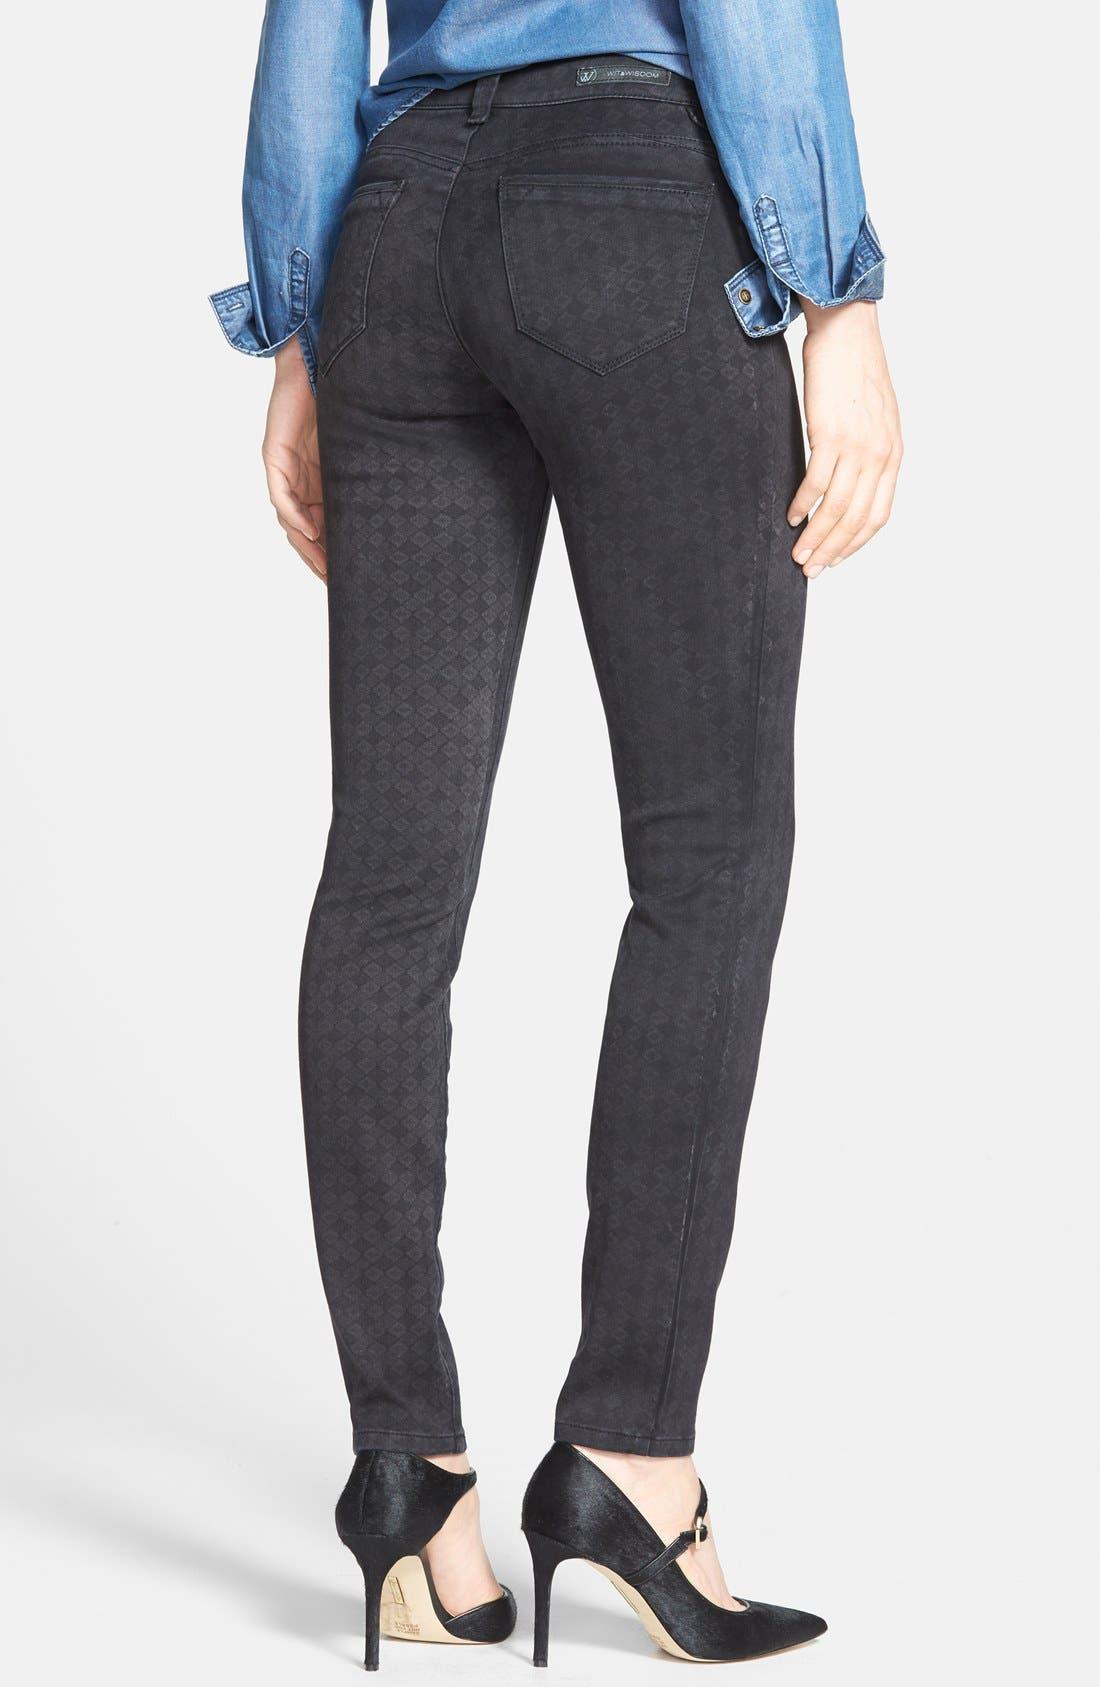 Alternate Image 2  - Wit & Wisdom Diamond Stencil Skinny Jeans (Black) (Nordstrom Exclusive)